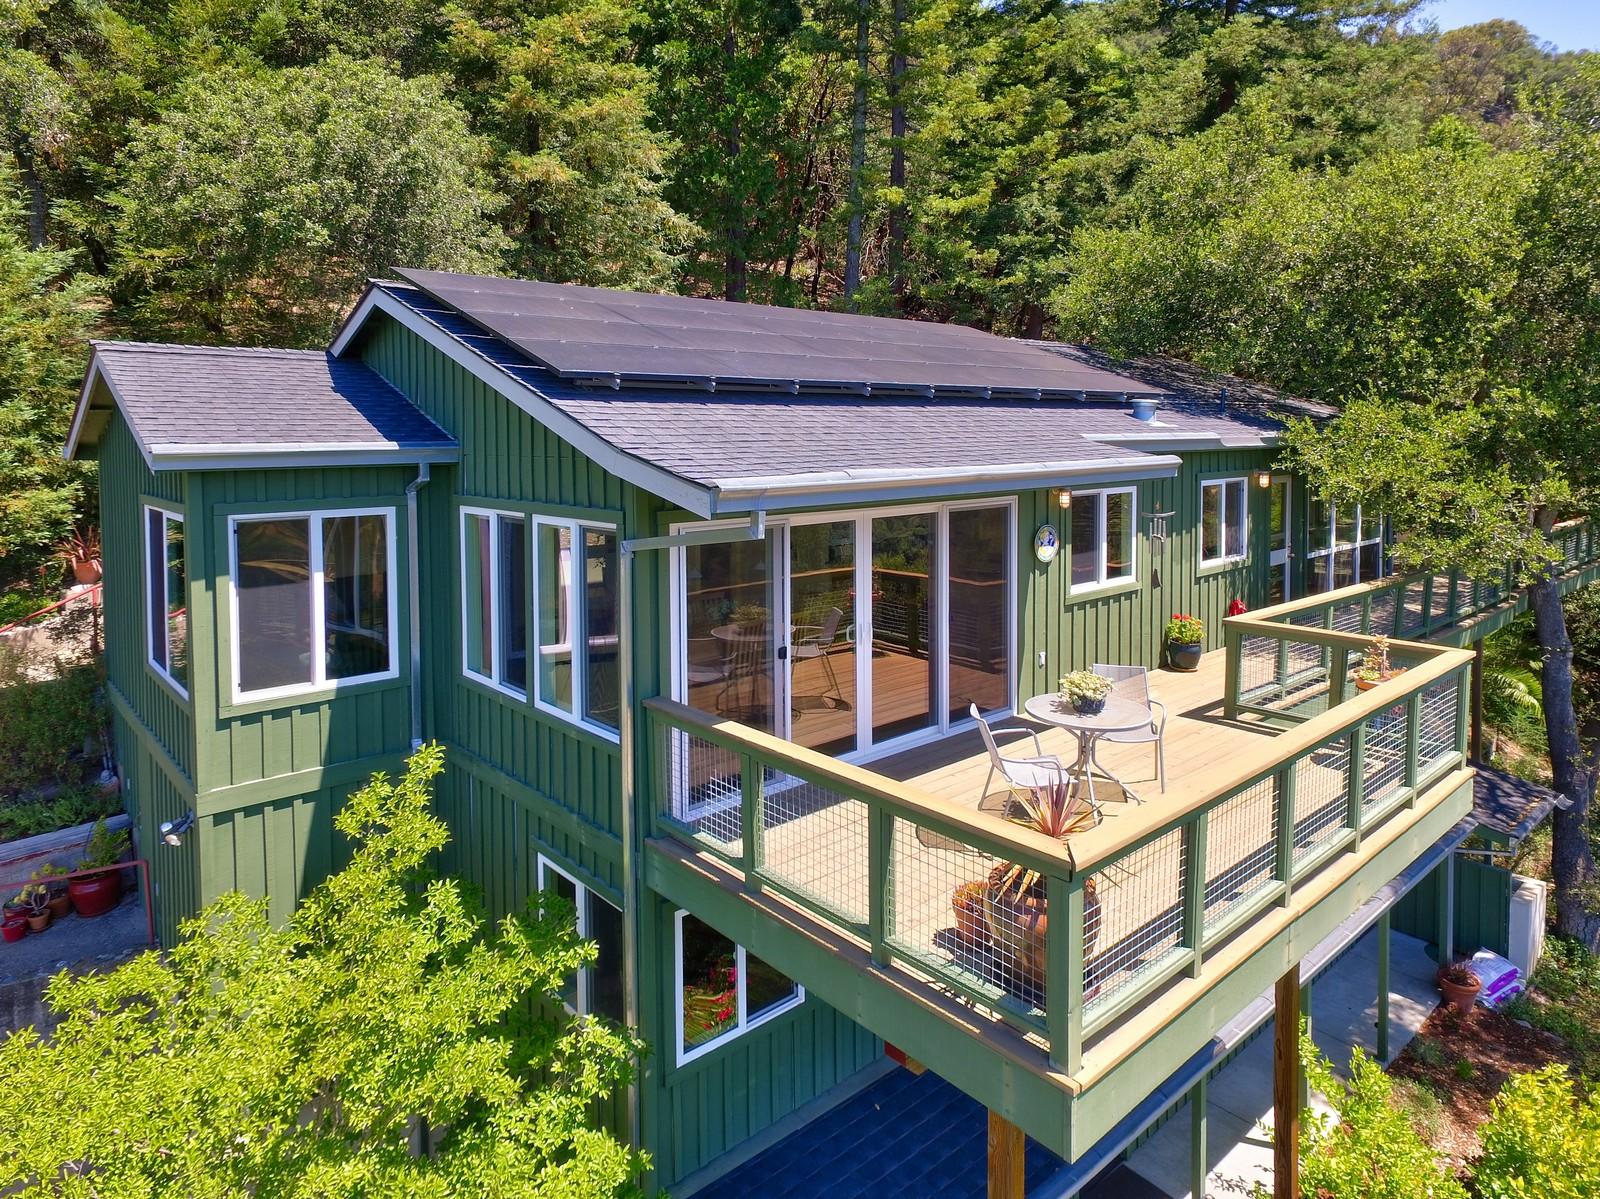 獨棟家庭住宅 為 出售 在 Exceptional Healdsburg Home 1831 Madrone Avenue Healdsburg, 加利福尼亞州, 95448 美國